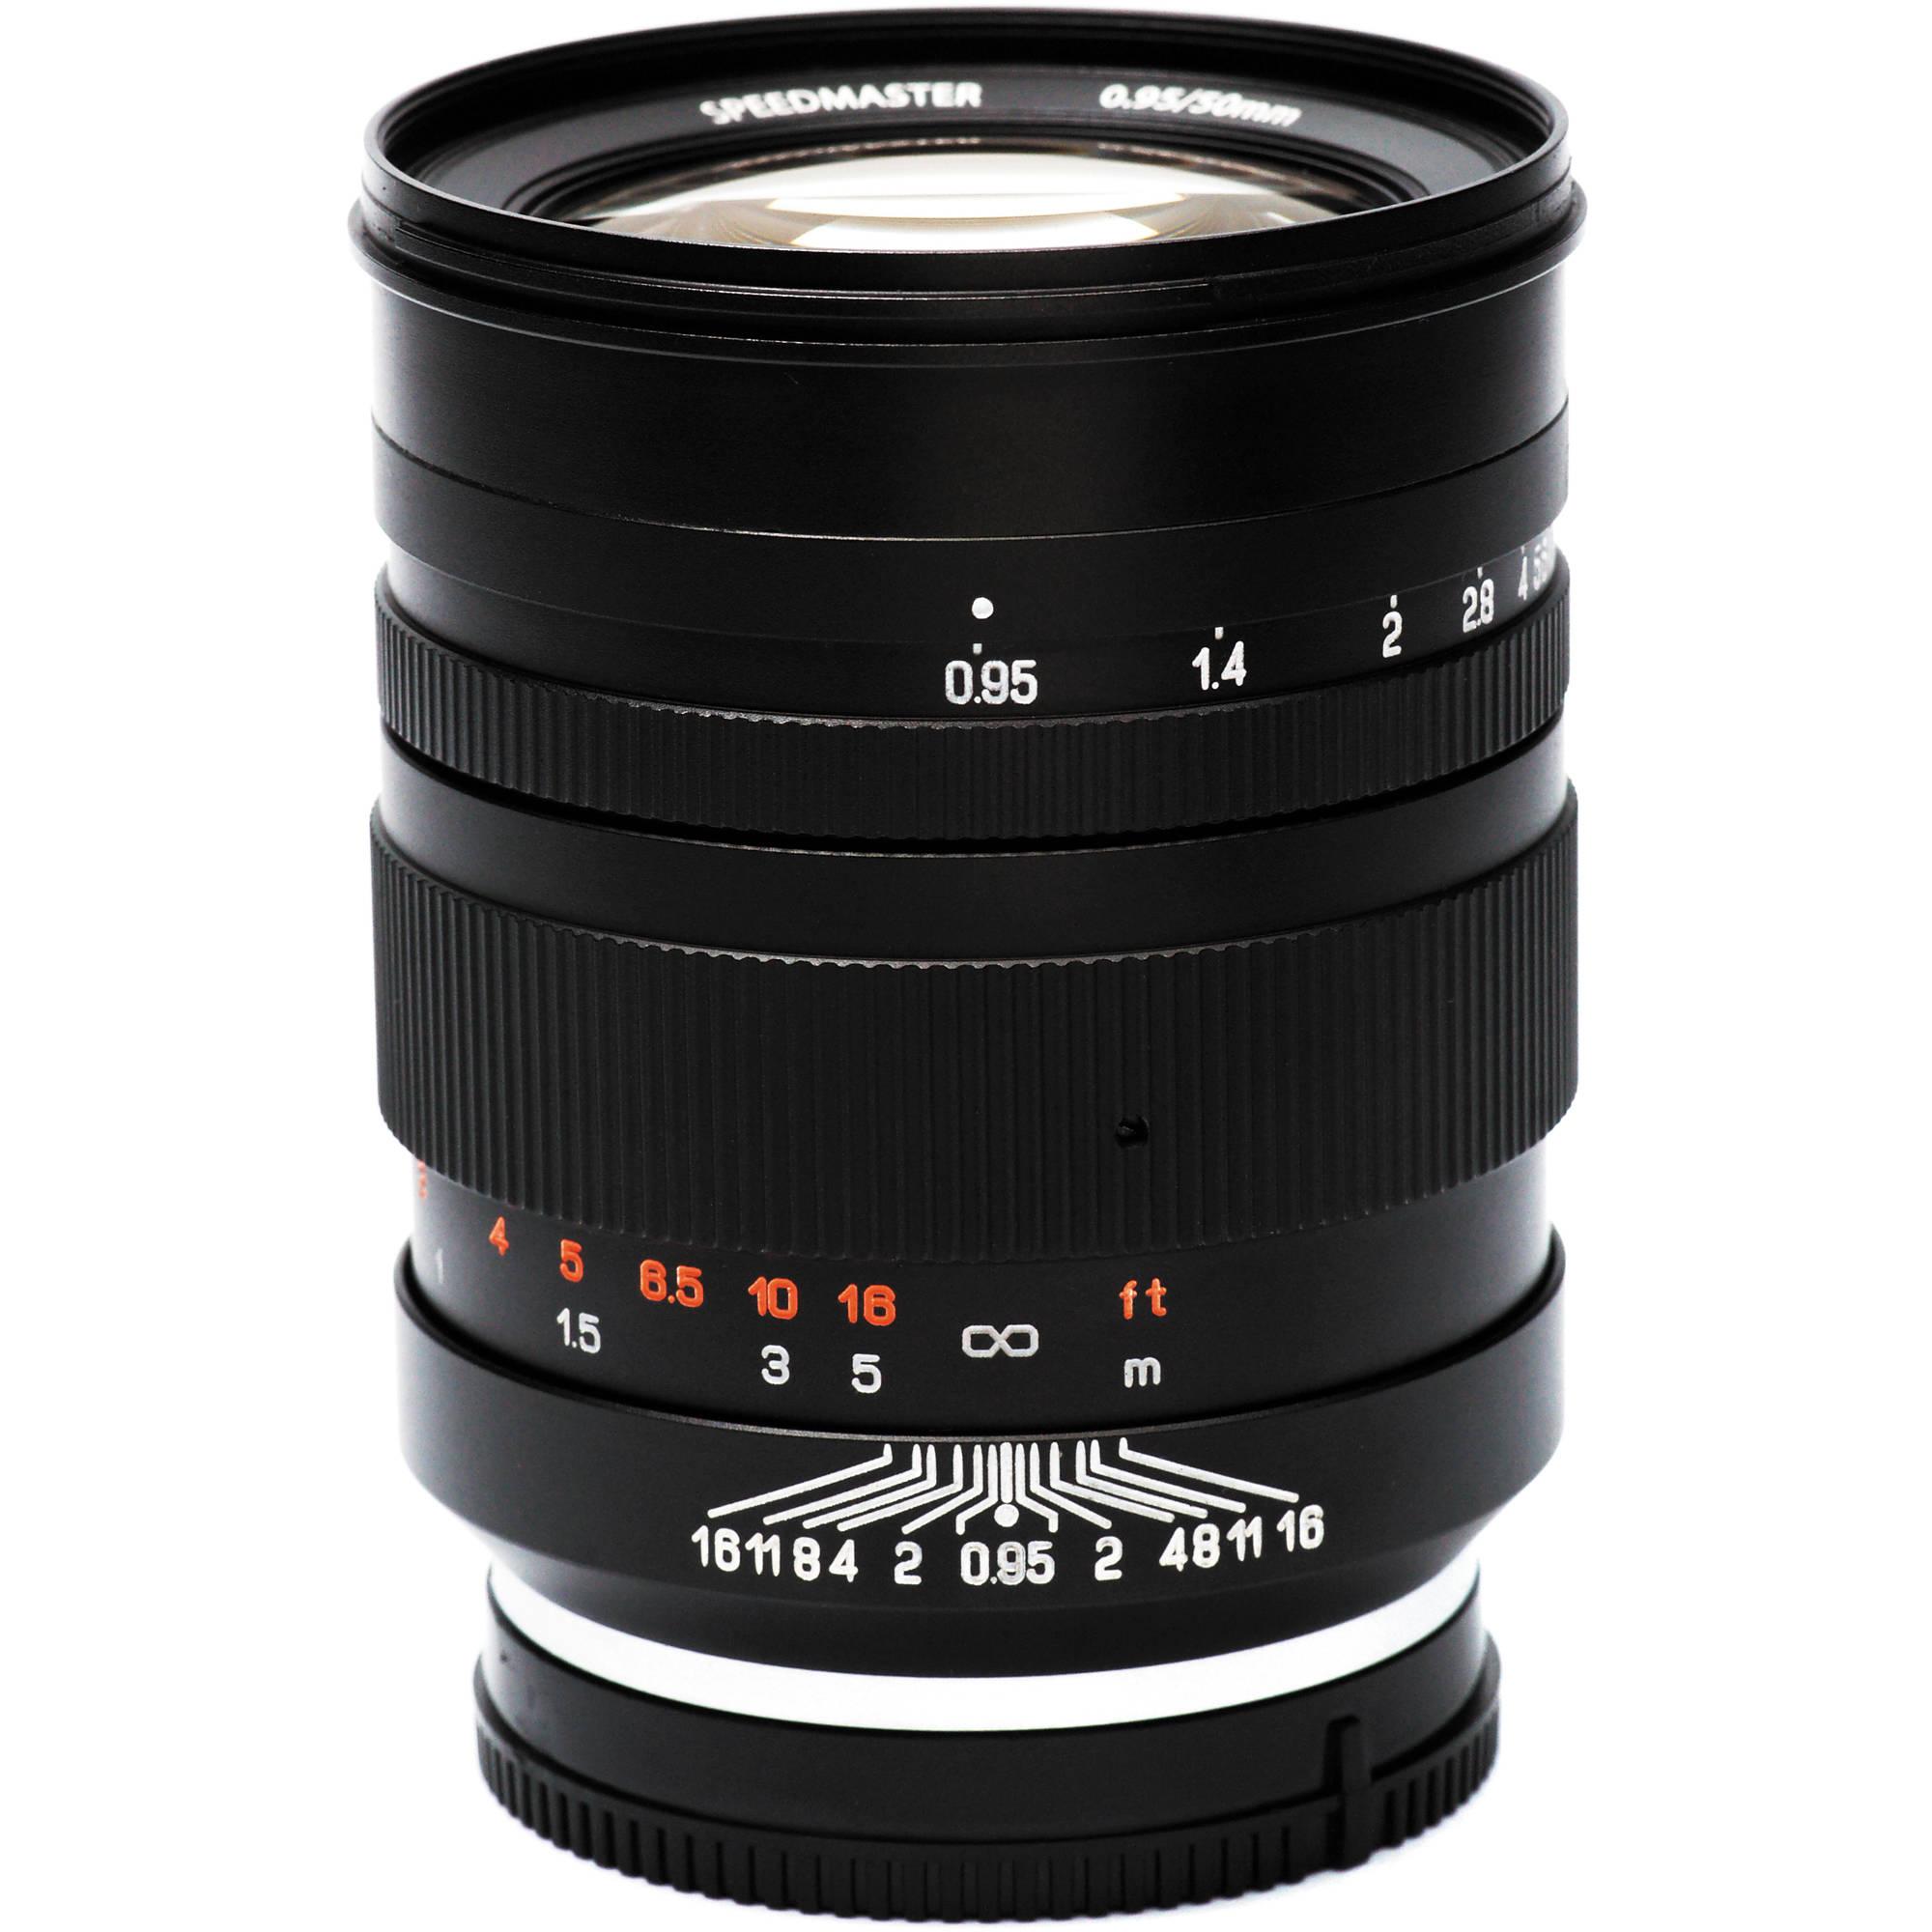 4ab9ce89a1 Mitakon Zhongyi Speedmaster 50mm f/0.95 Lens for Sony E-Mount